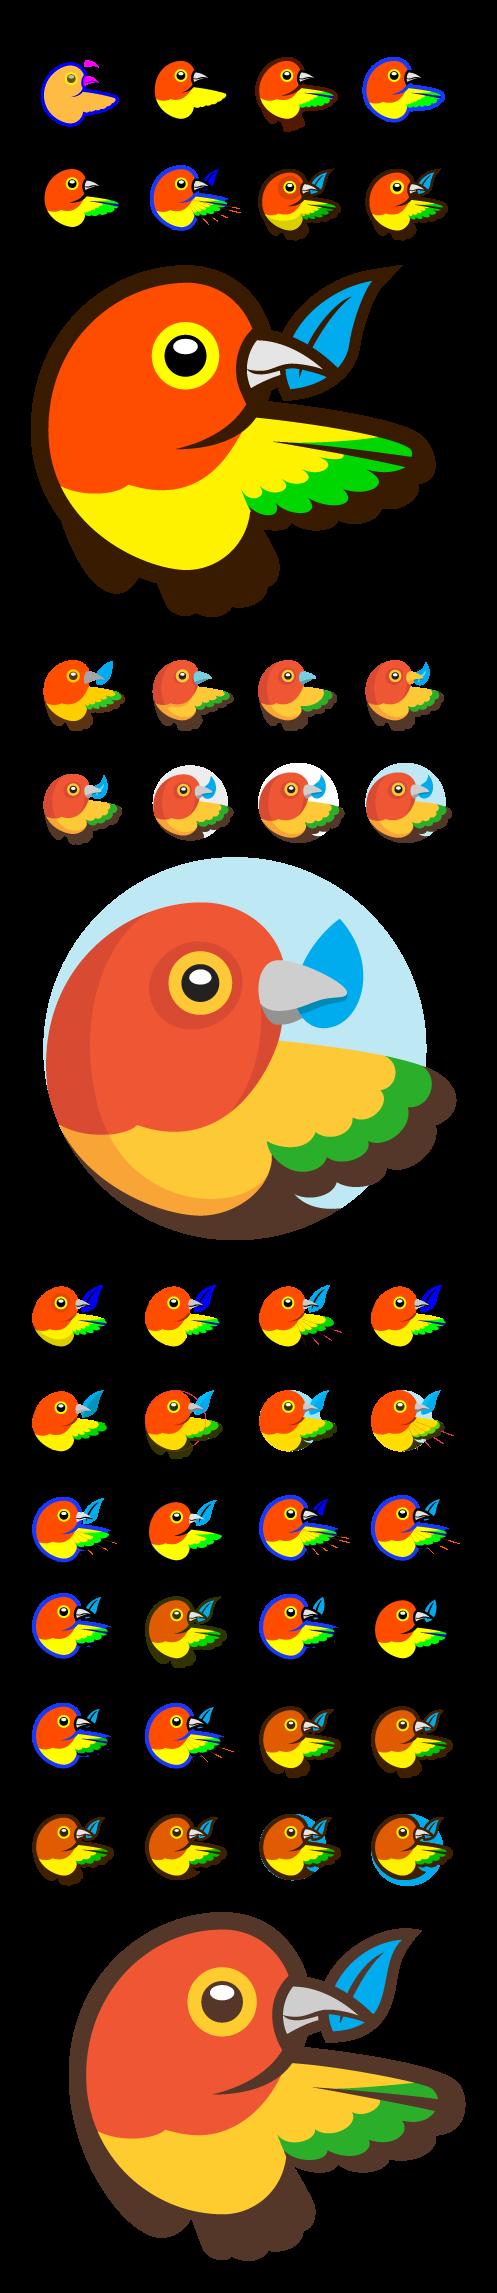 Bowerbird svg #7, Download drawings